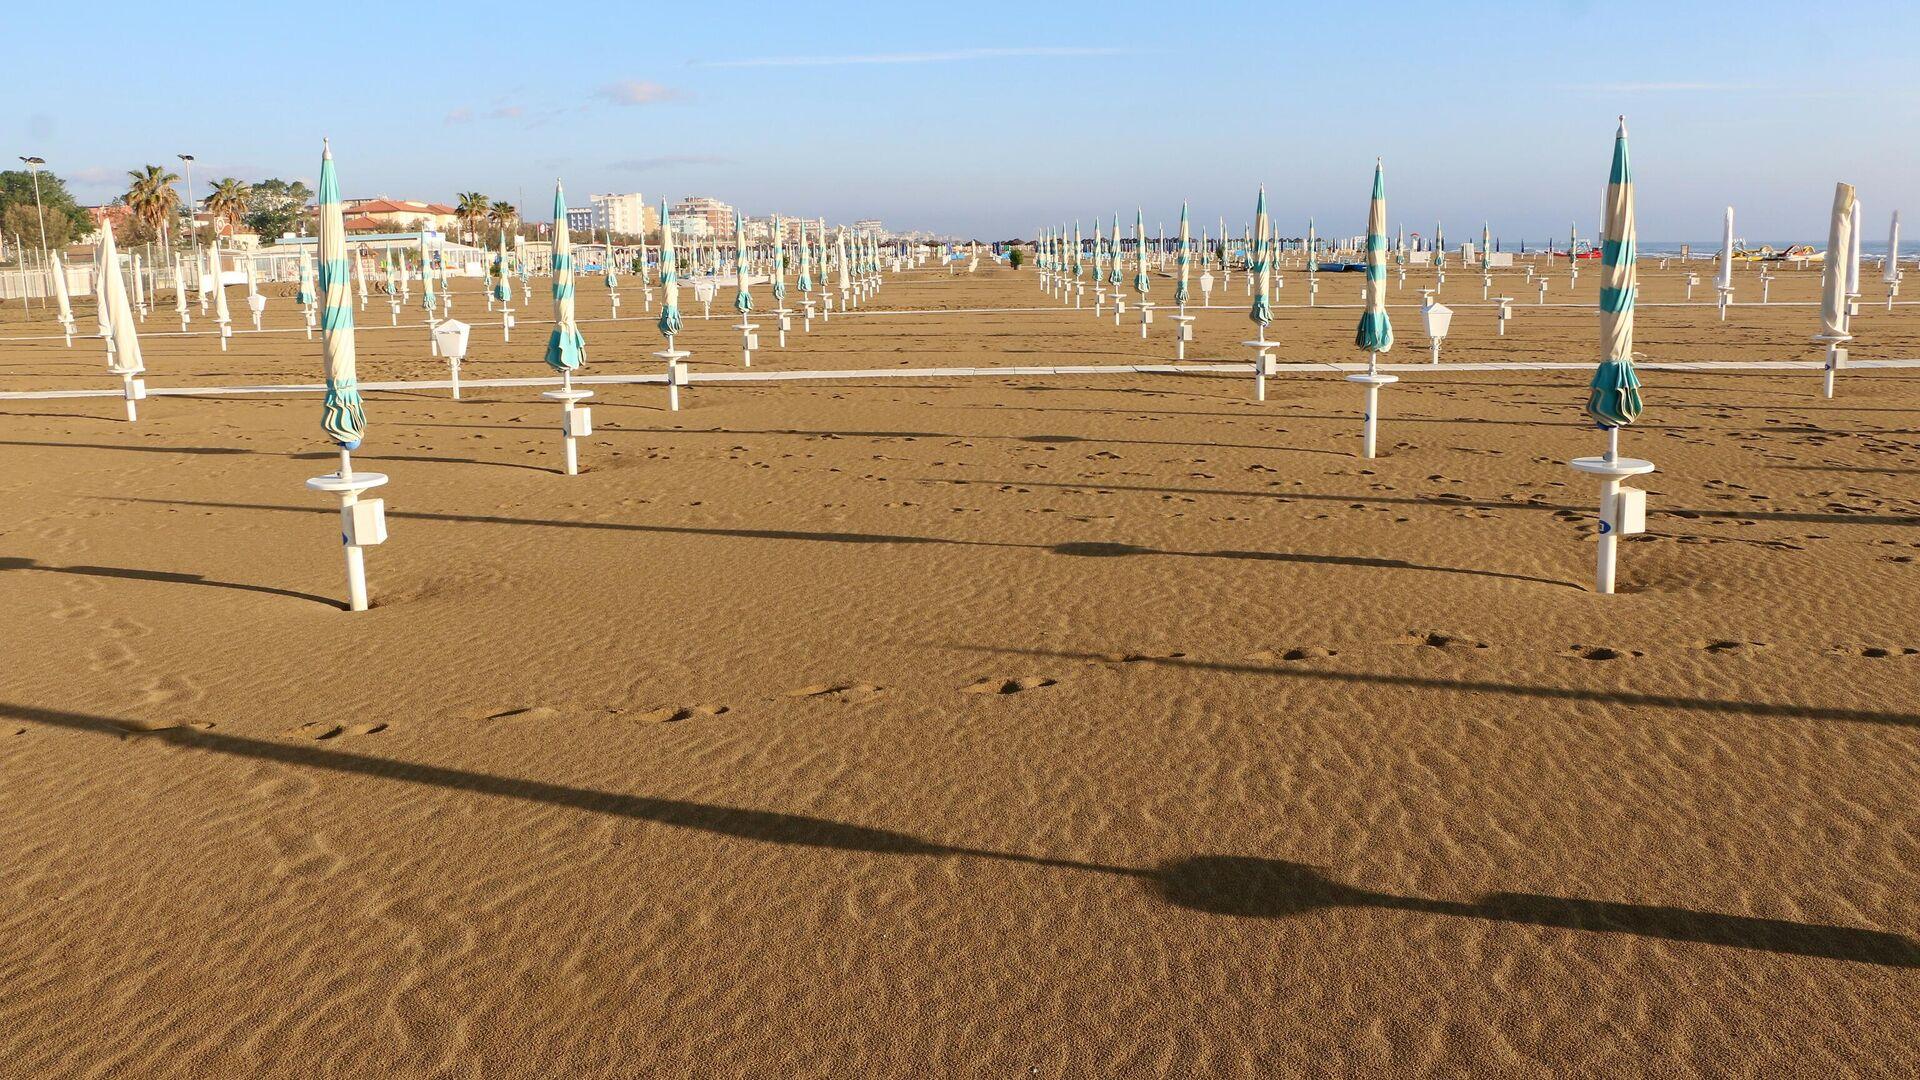 Spiaggia vuota - Sputnik Italia, 1920, 01.06.2021